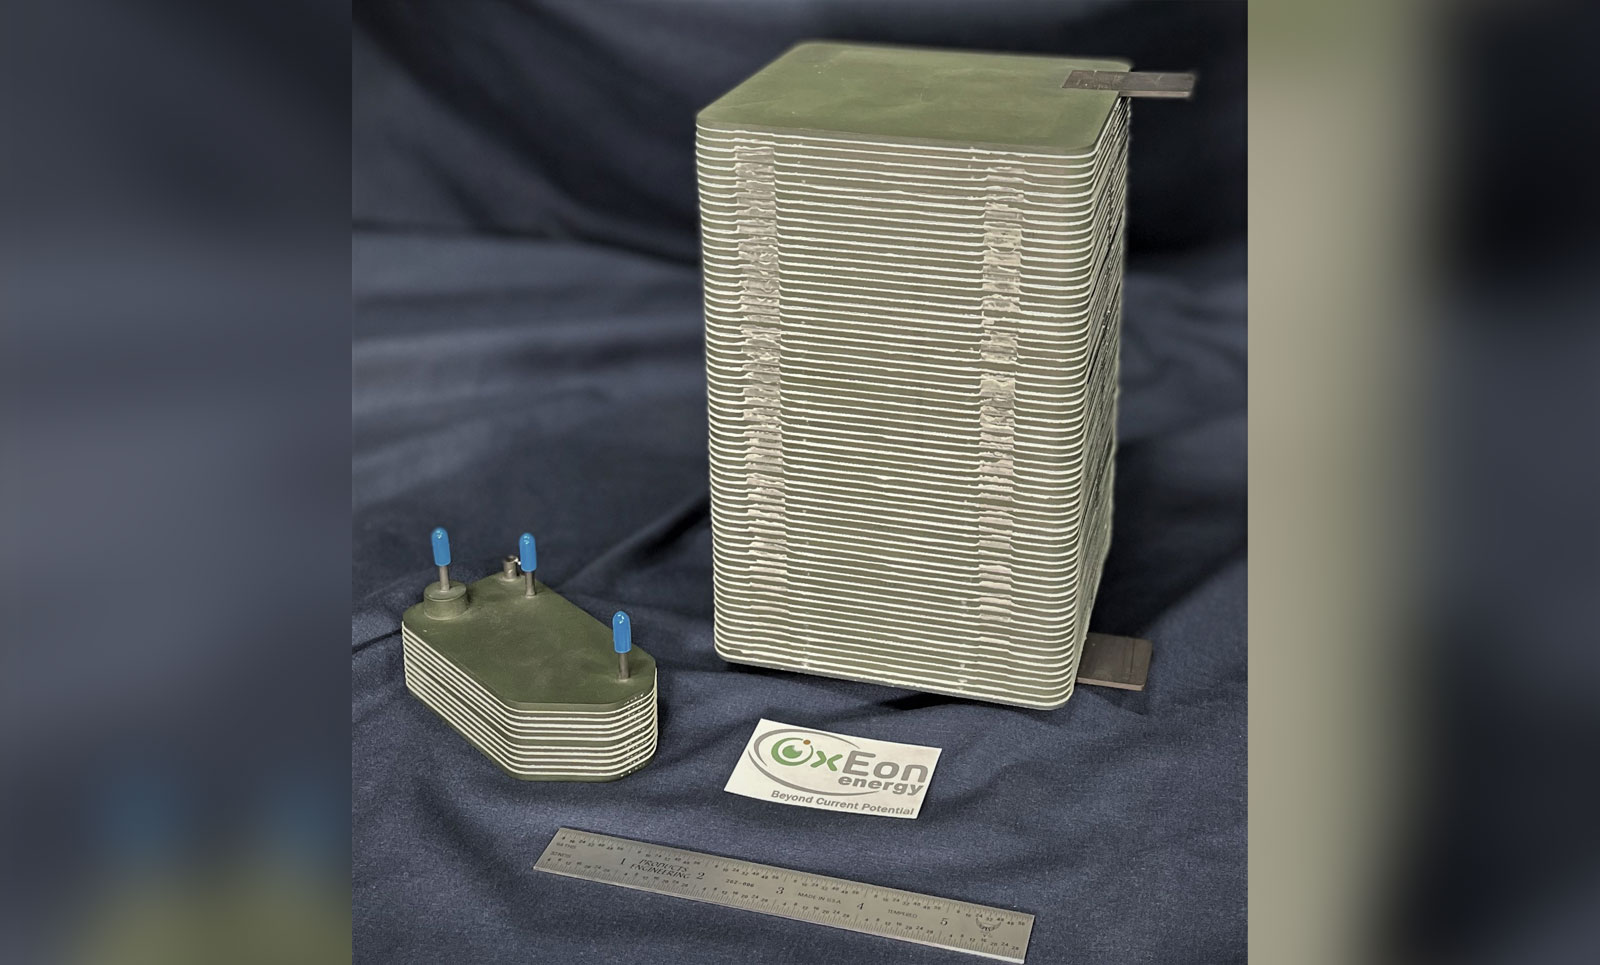 Solid Oxide Fuel Stack